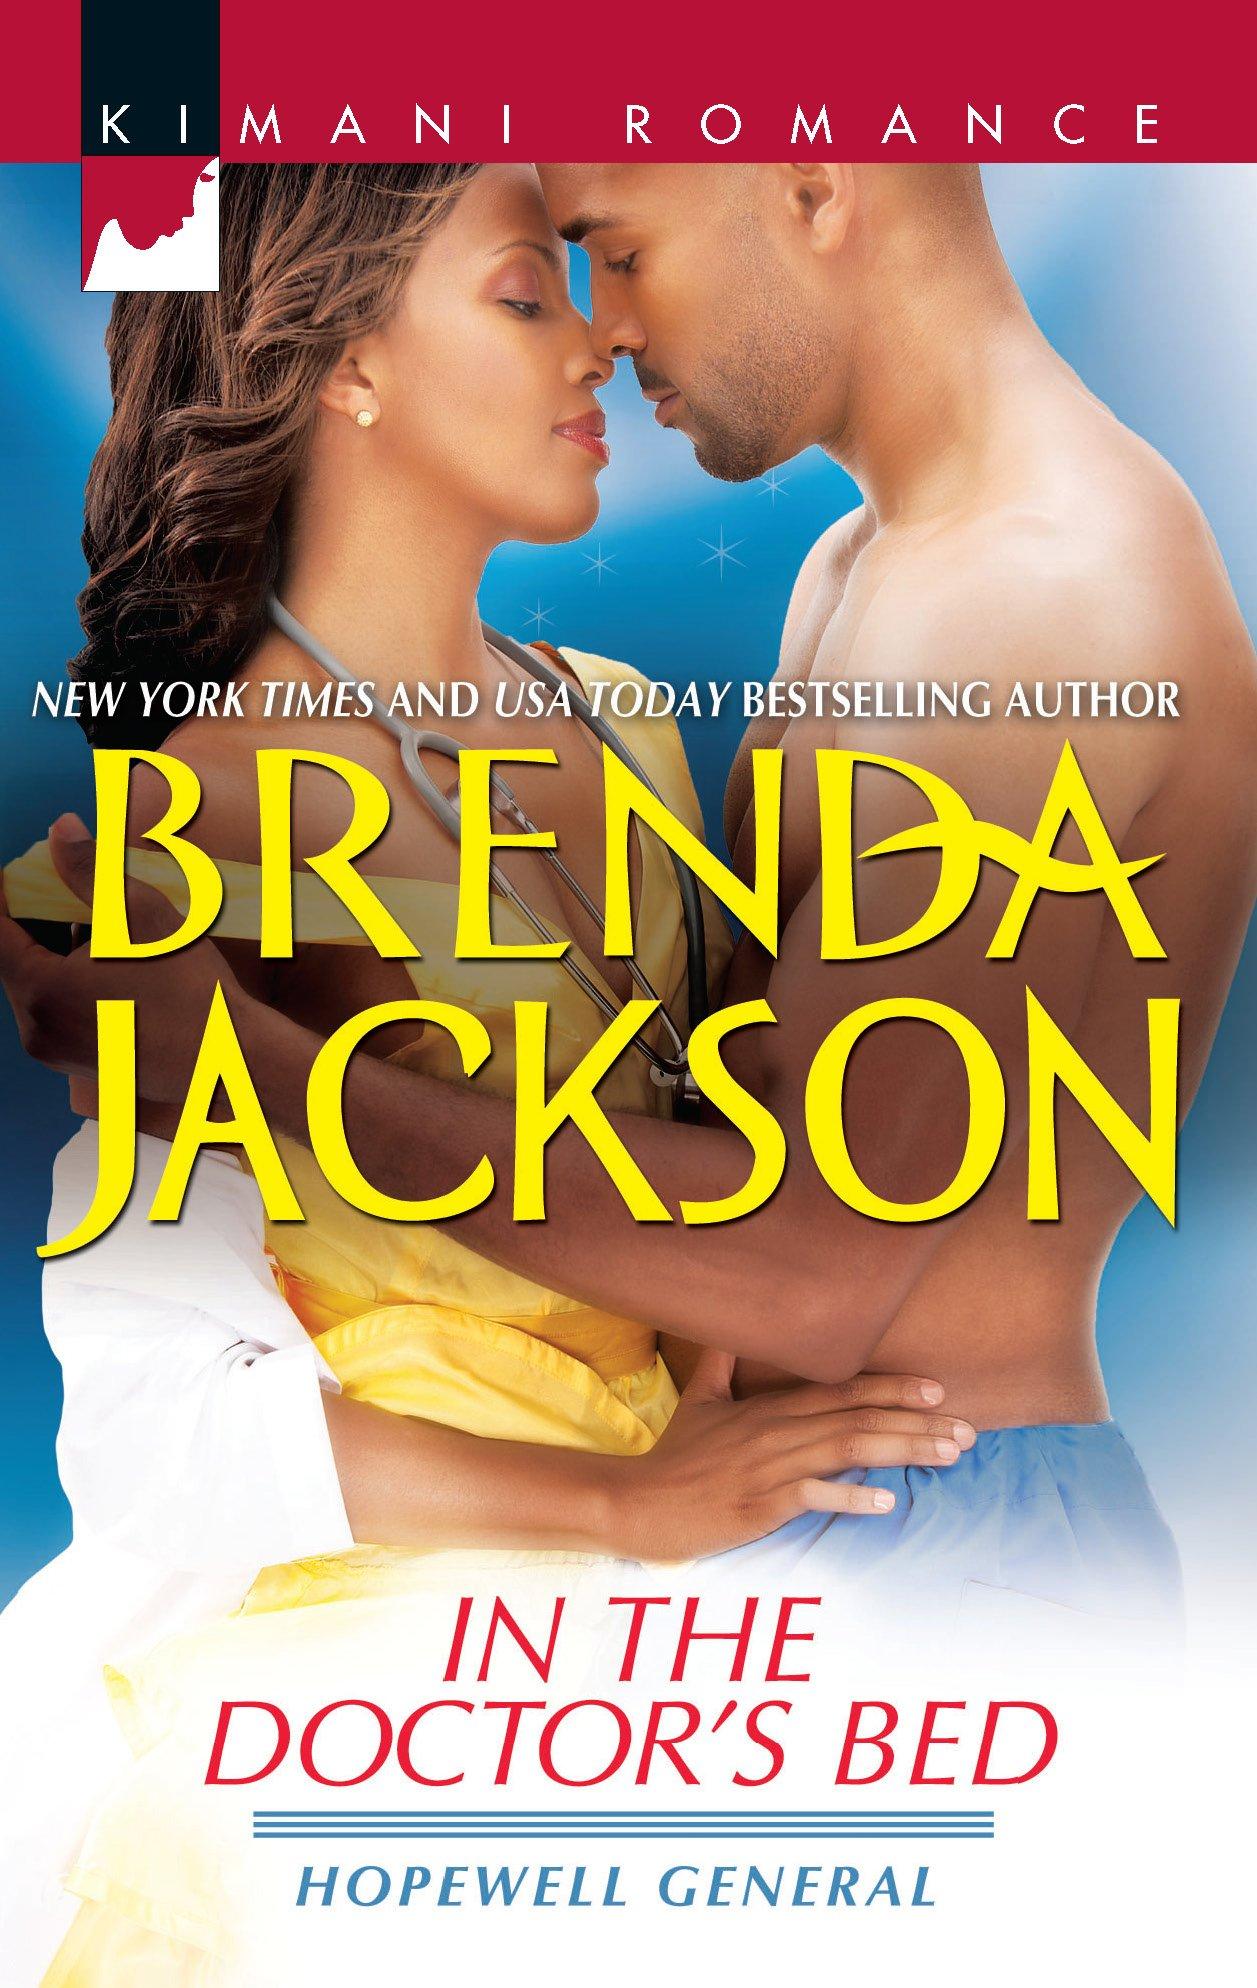 In the Doctor's Bed (Kimani Romance): Amazon.co.uk: Brenda Jackson:  9780373862207: Books